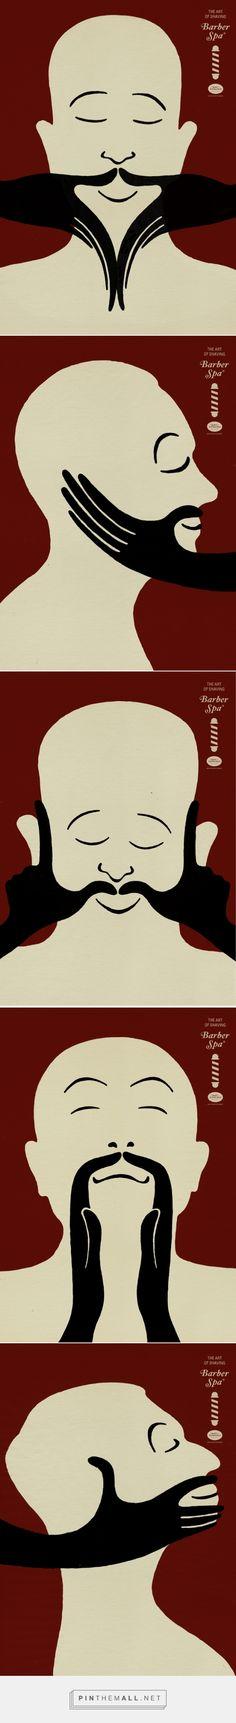 The Art of Shaving спутала в рекламе руки с волосами | Реклама Маркетинг PR - SOSTAV.RU - created via http://pinthemall.net